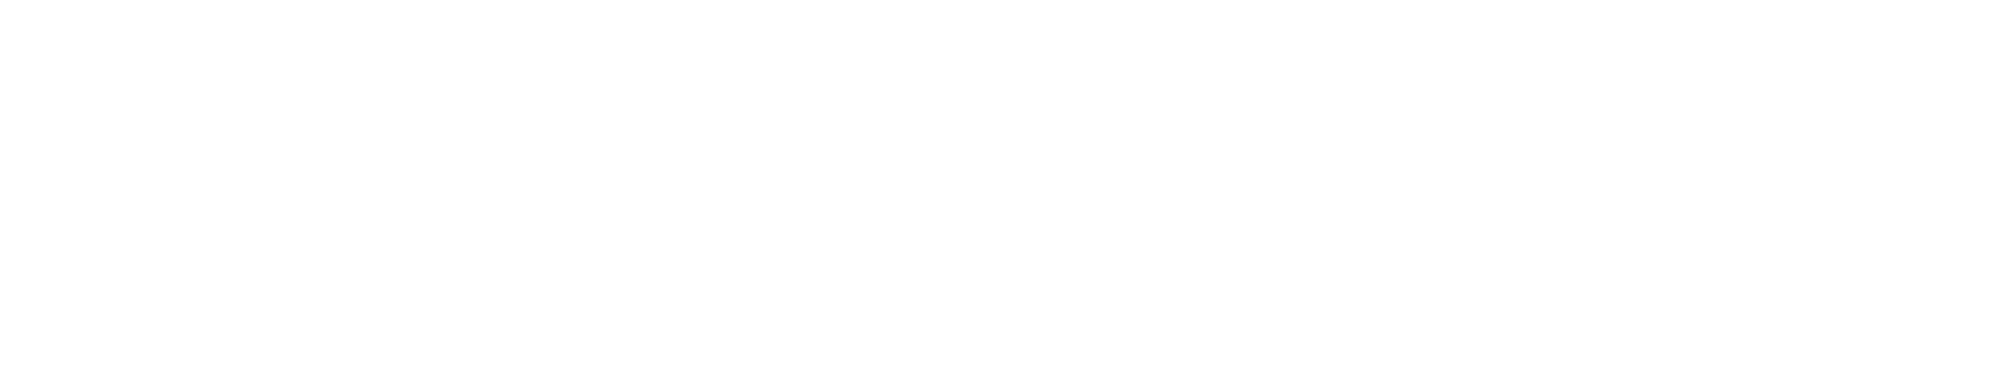 verge-logo-01.0.png